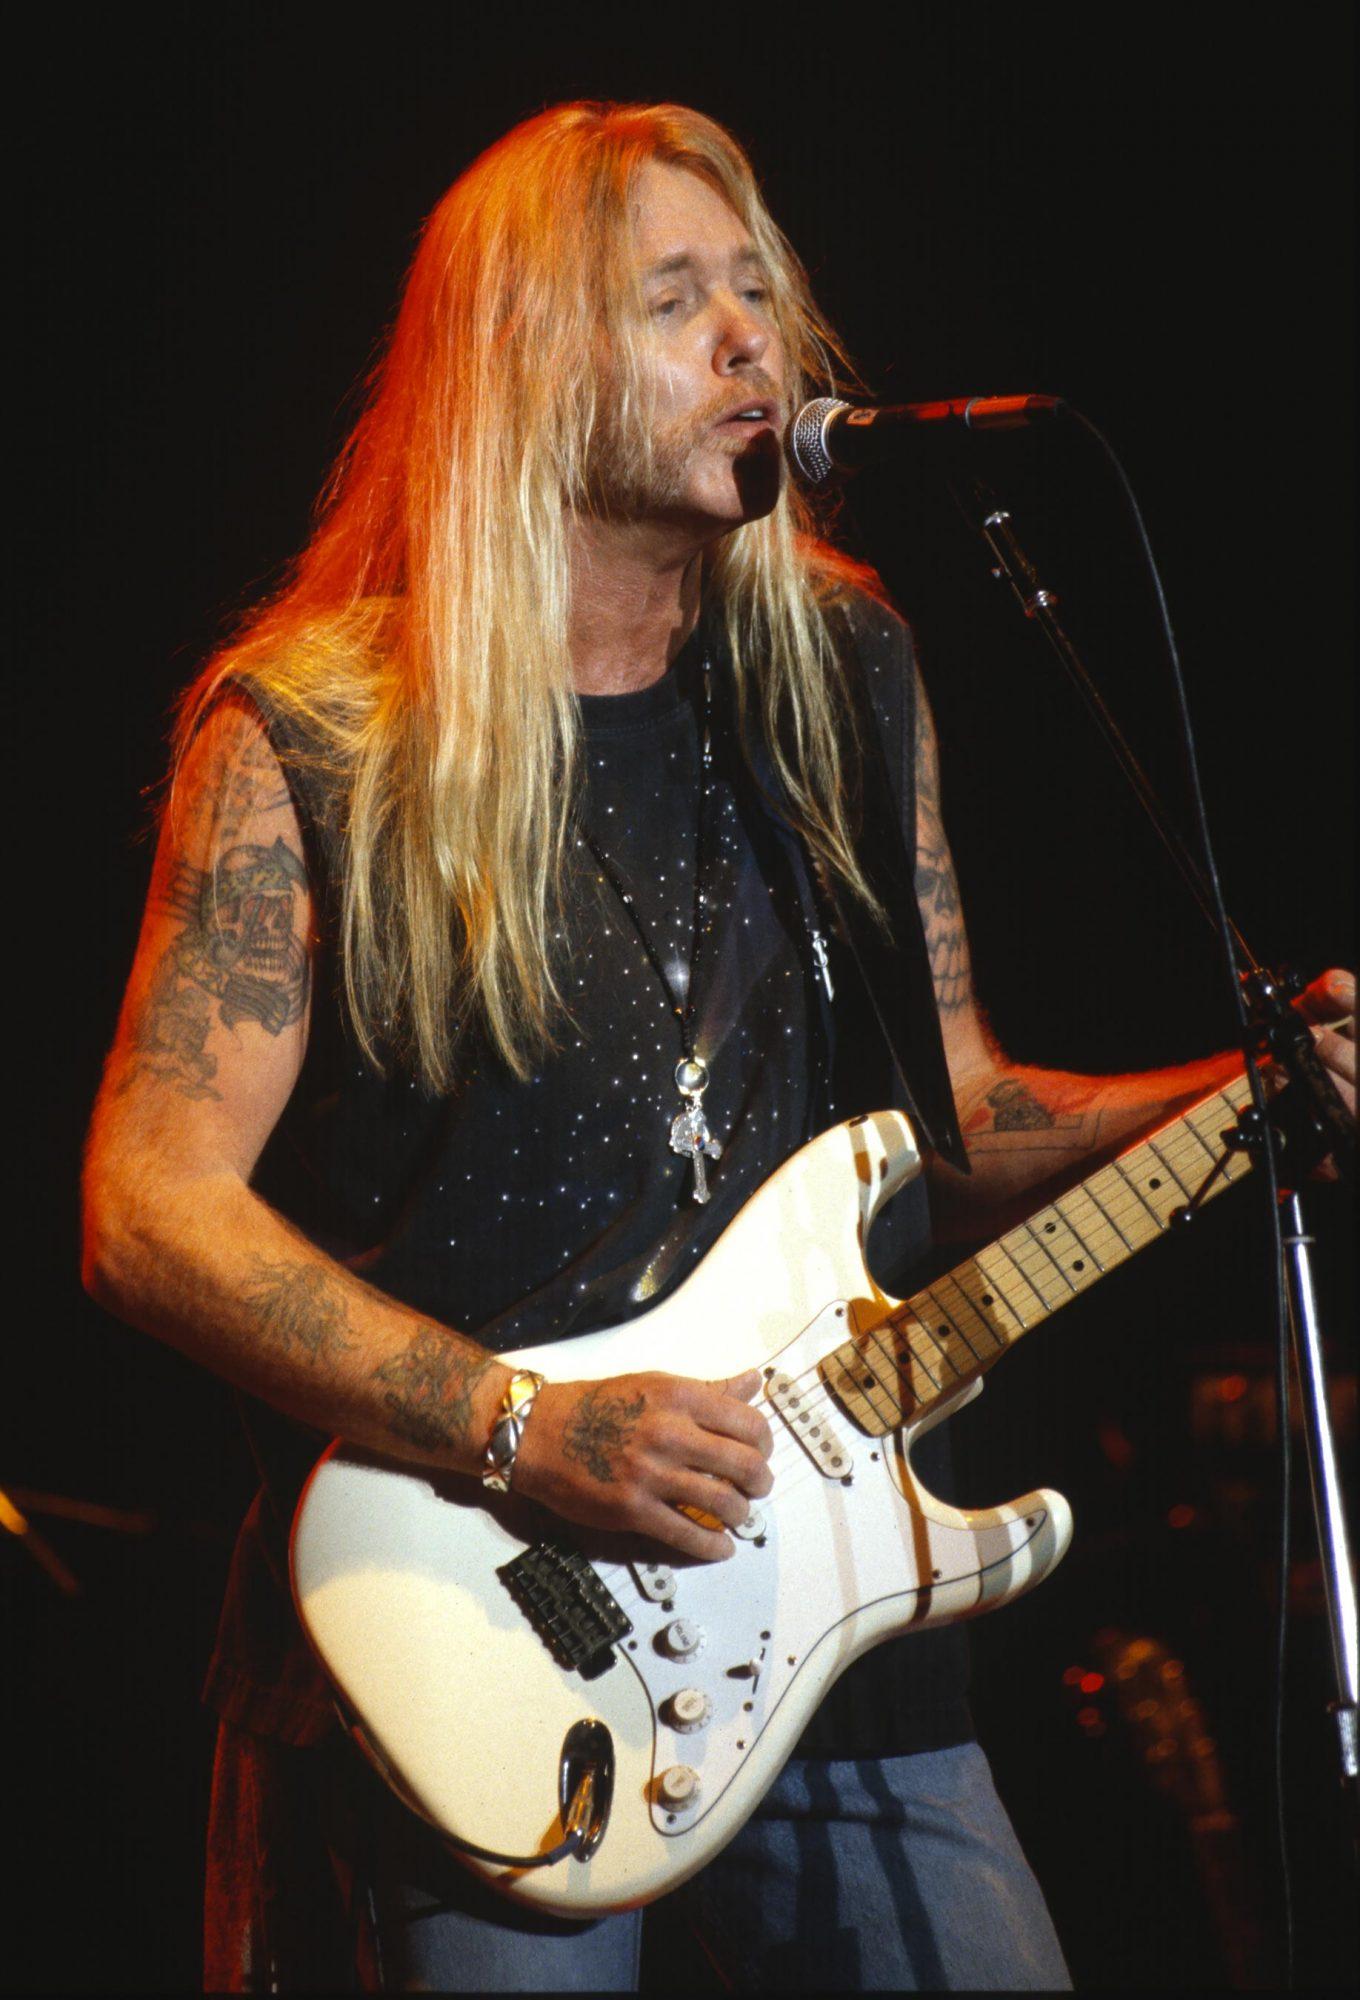 South Bay Blues Awards 1995 - San Jose CA